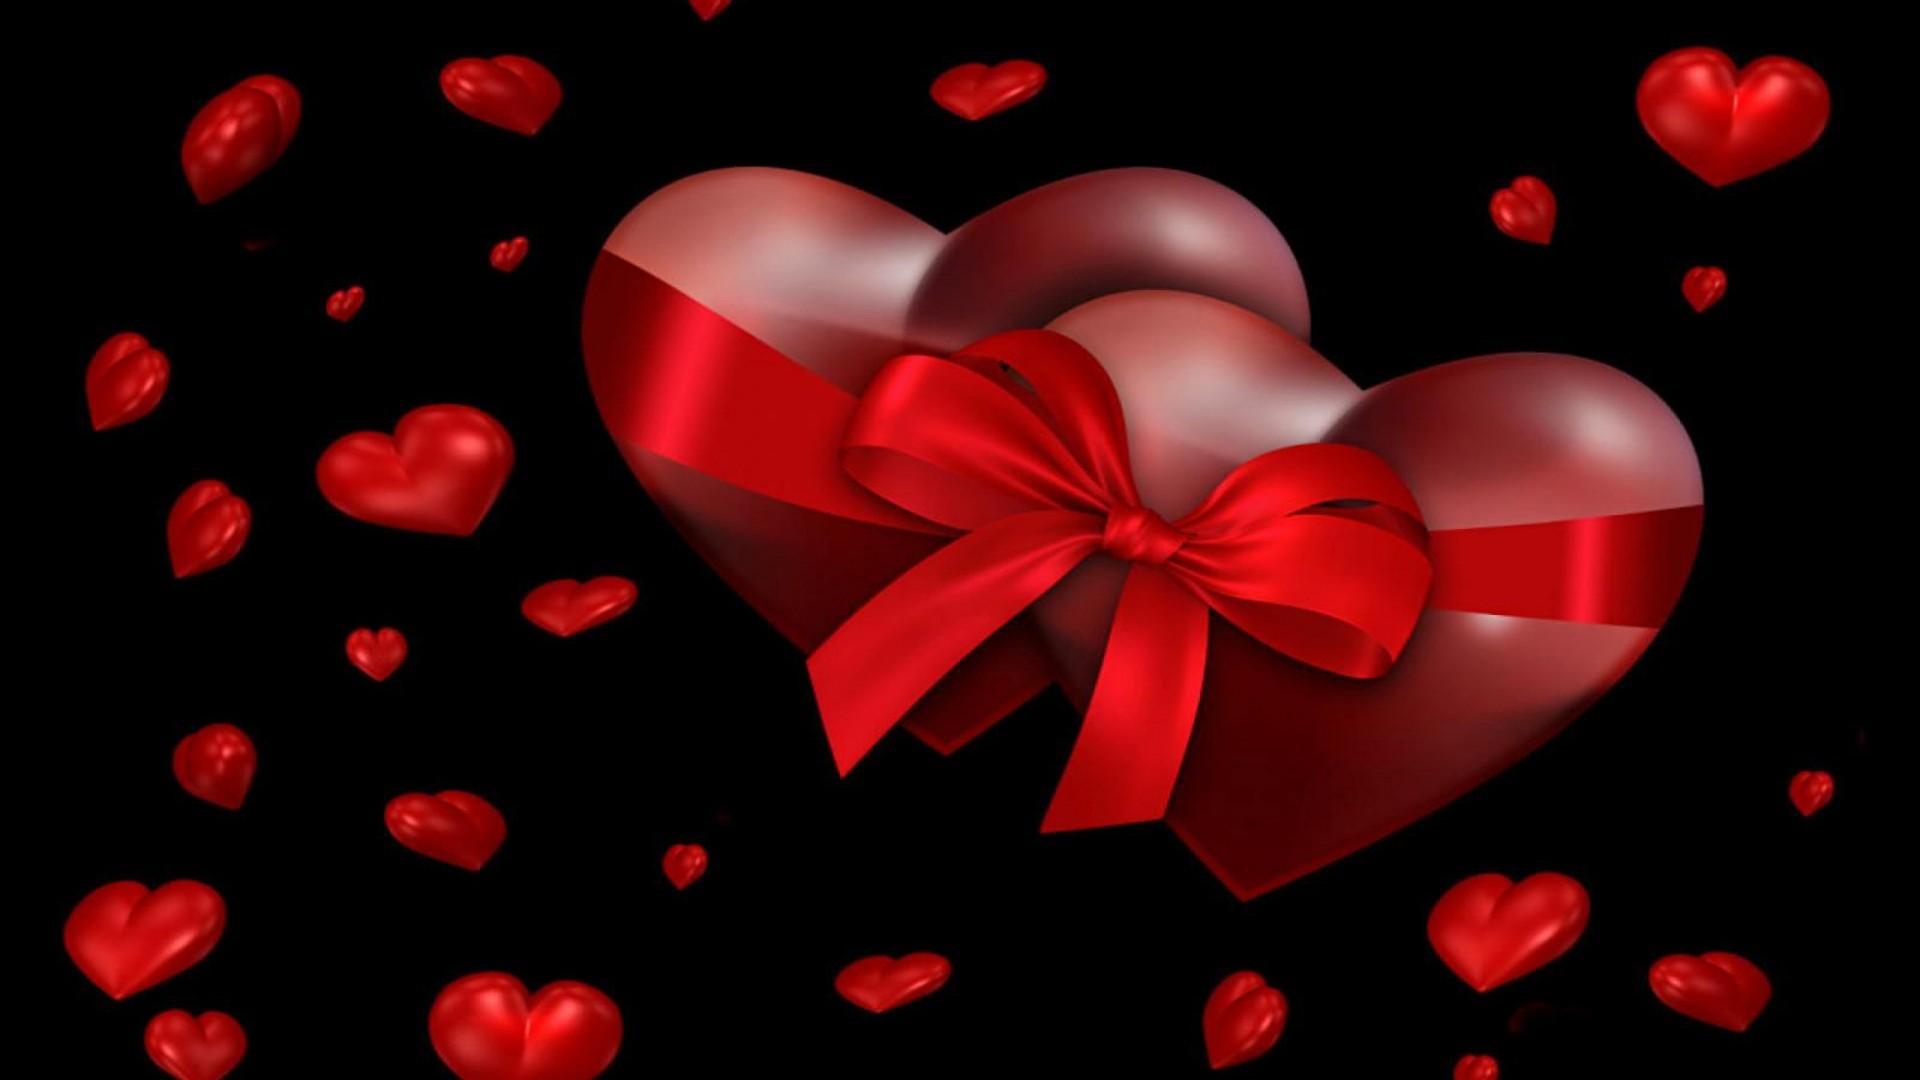 Valentine Day HD 3d Wallpaper 2021 Cute Wallpapers 1920x1080